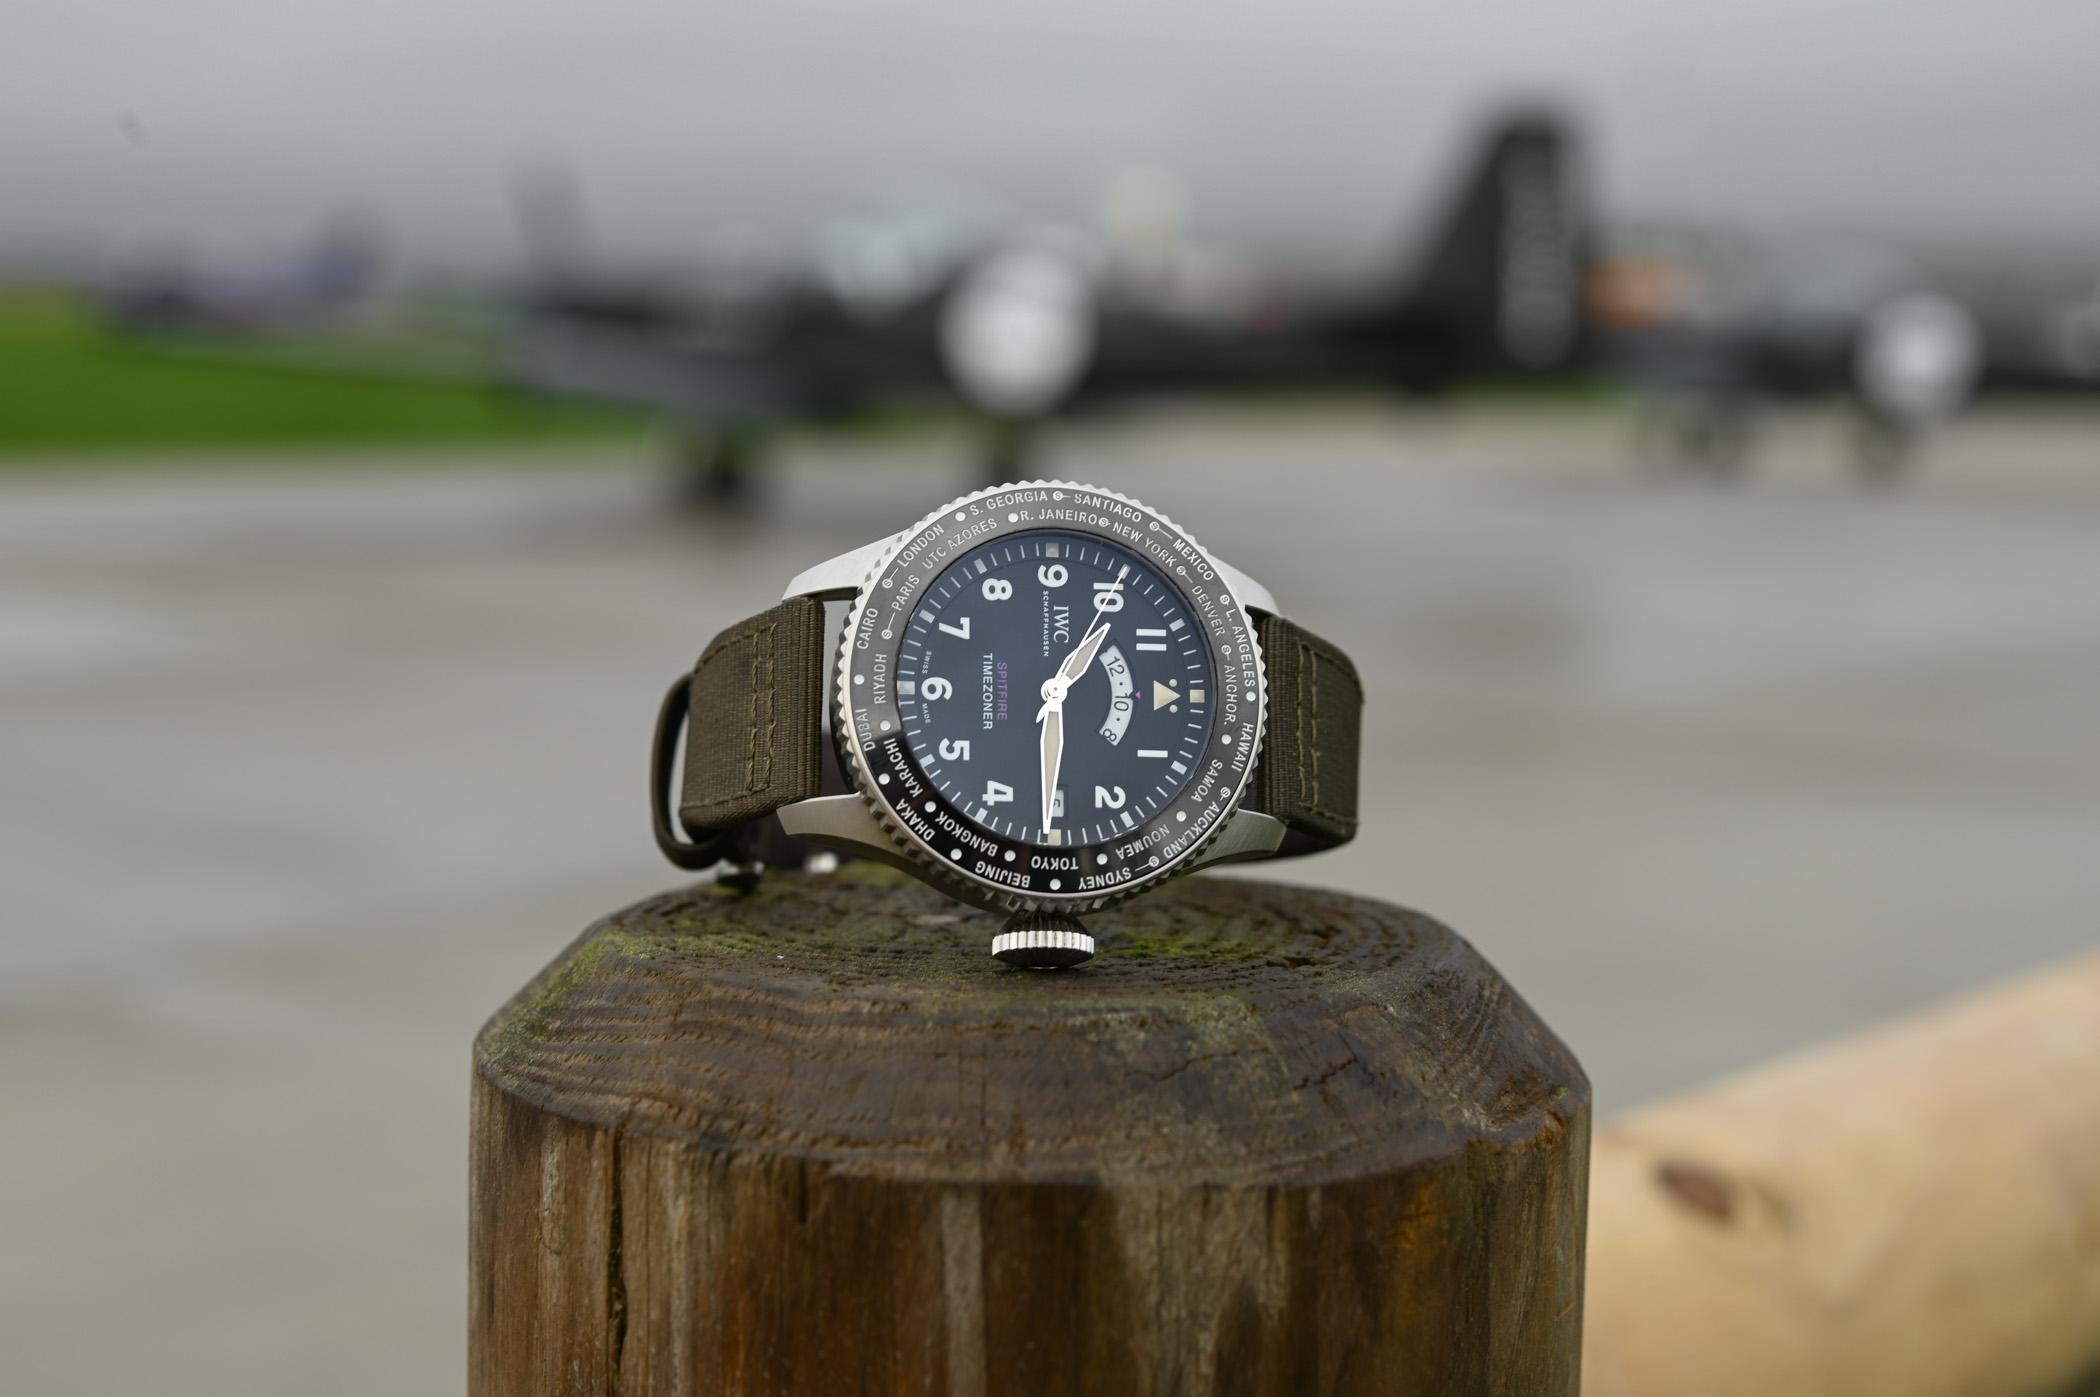 IWC Pilots Watch Timezoner Spitfire Edition The Longest Flight IW395501 - SIHH 2019